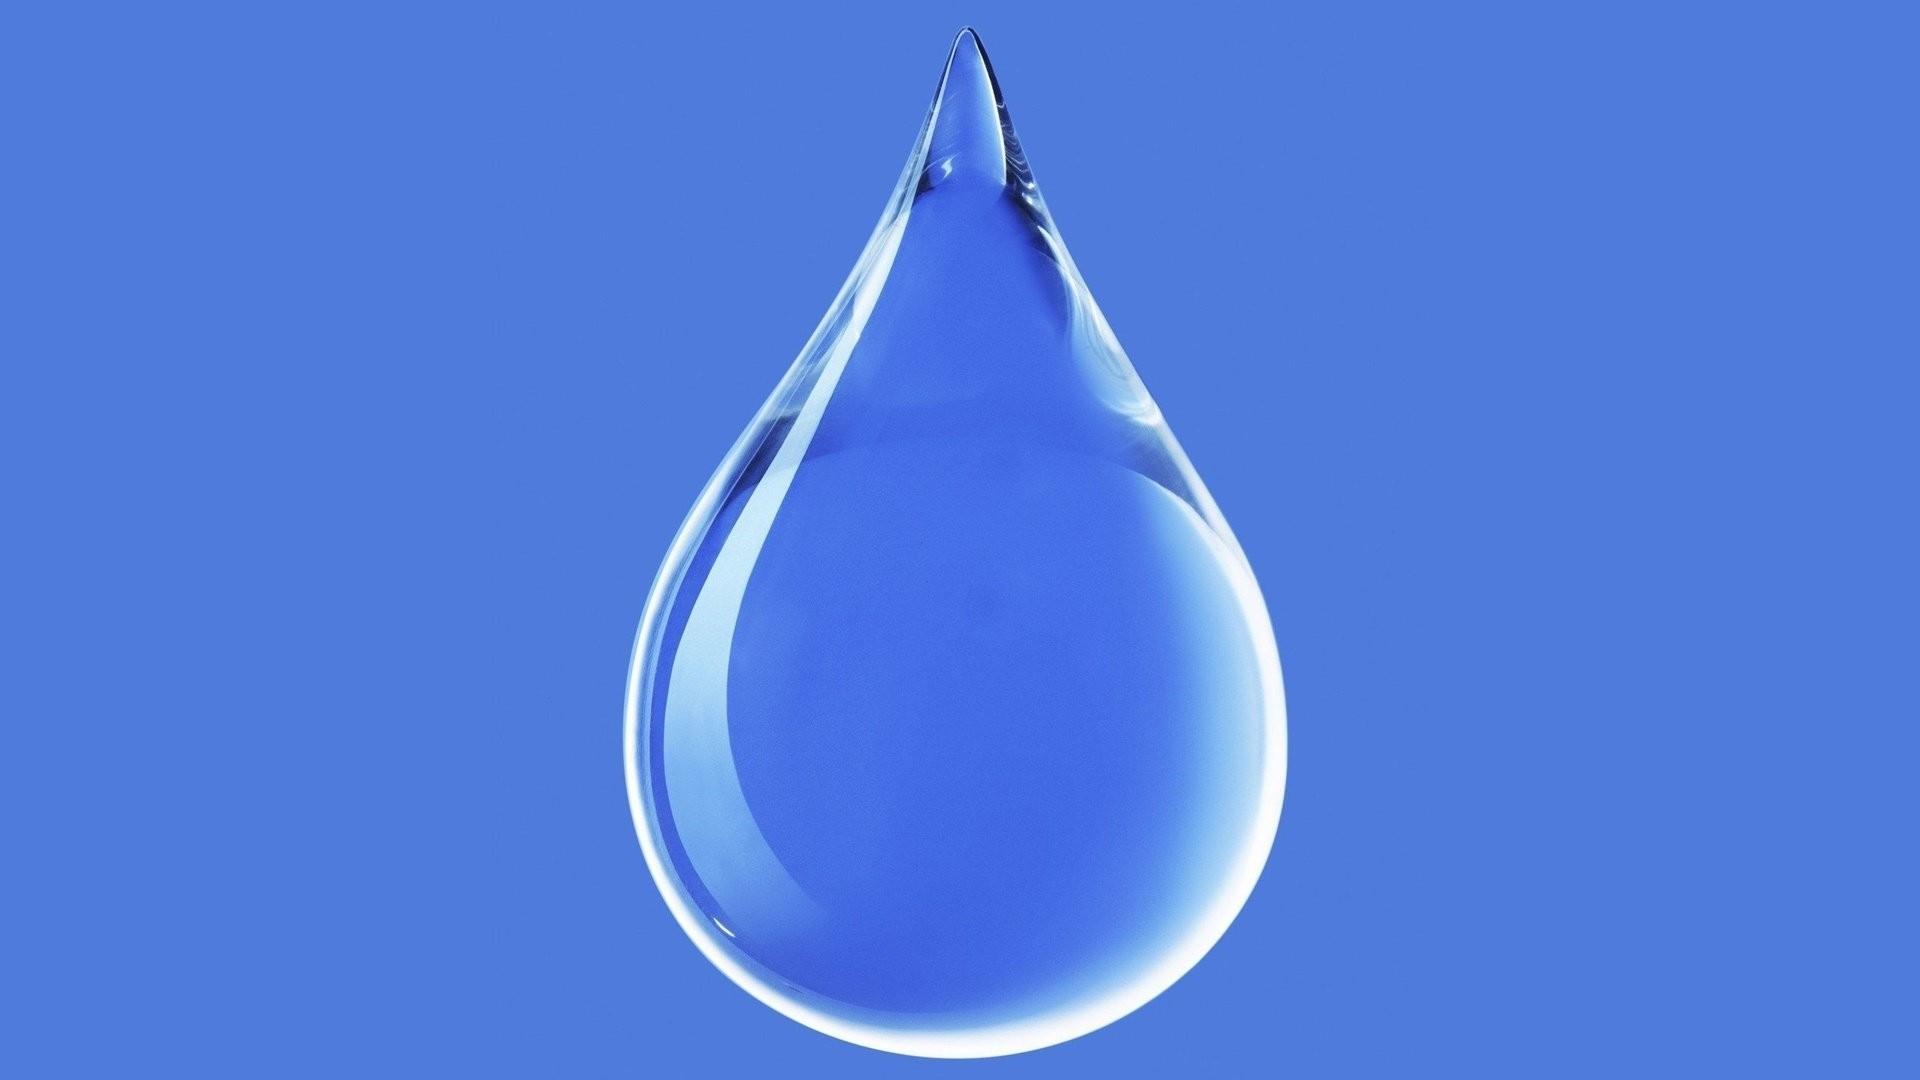 Water Drop hd wallpaper download